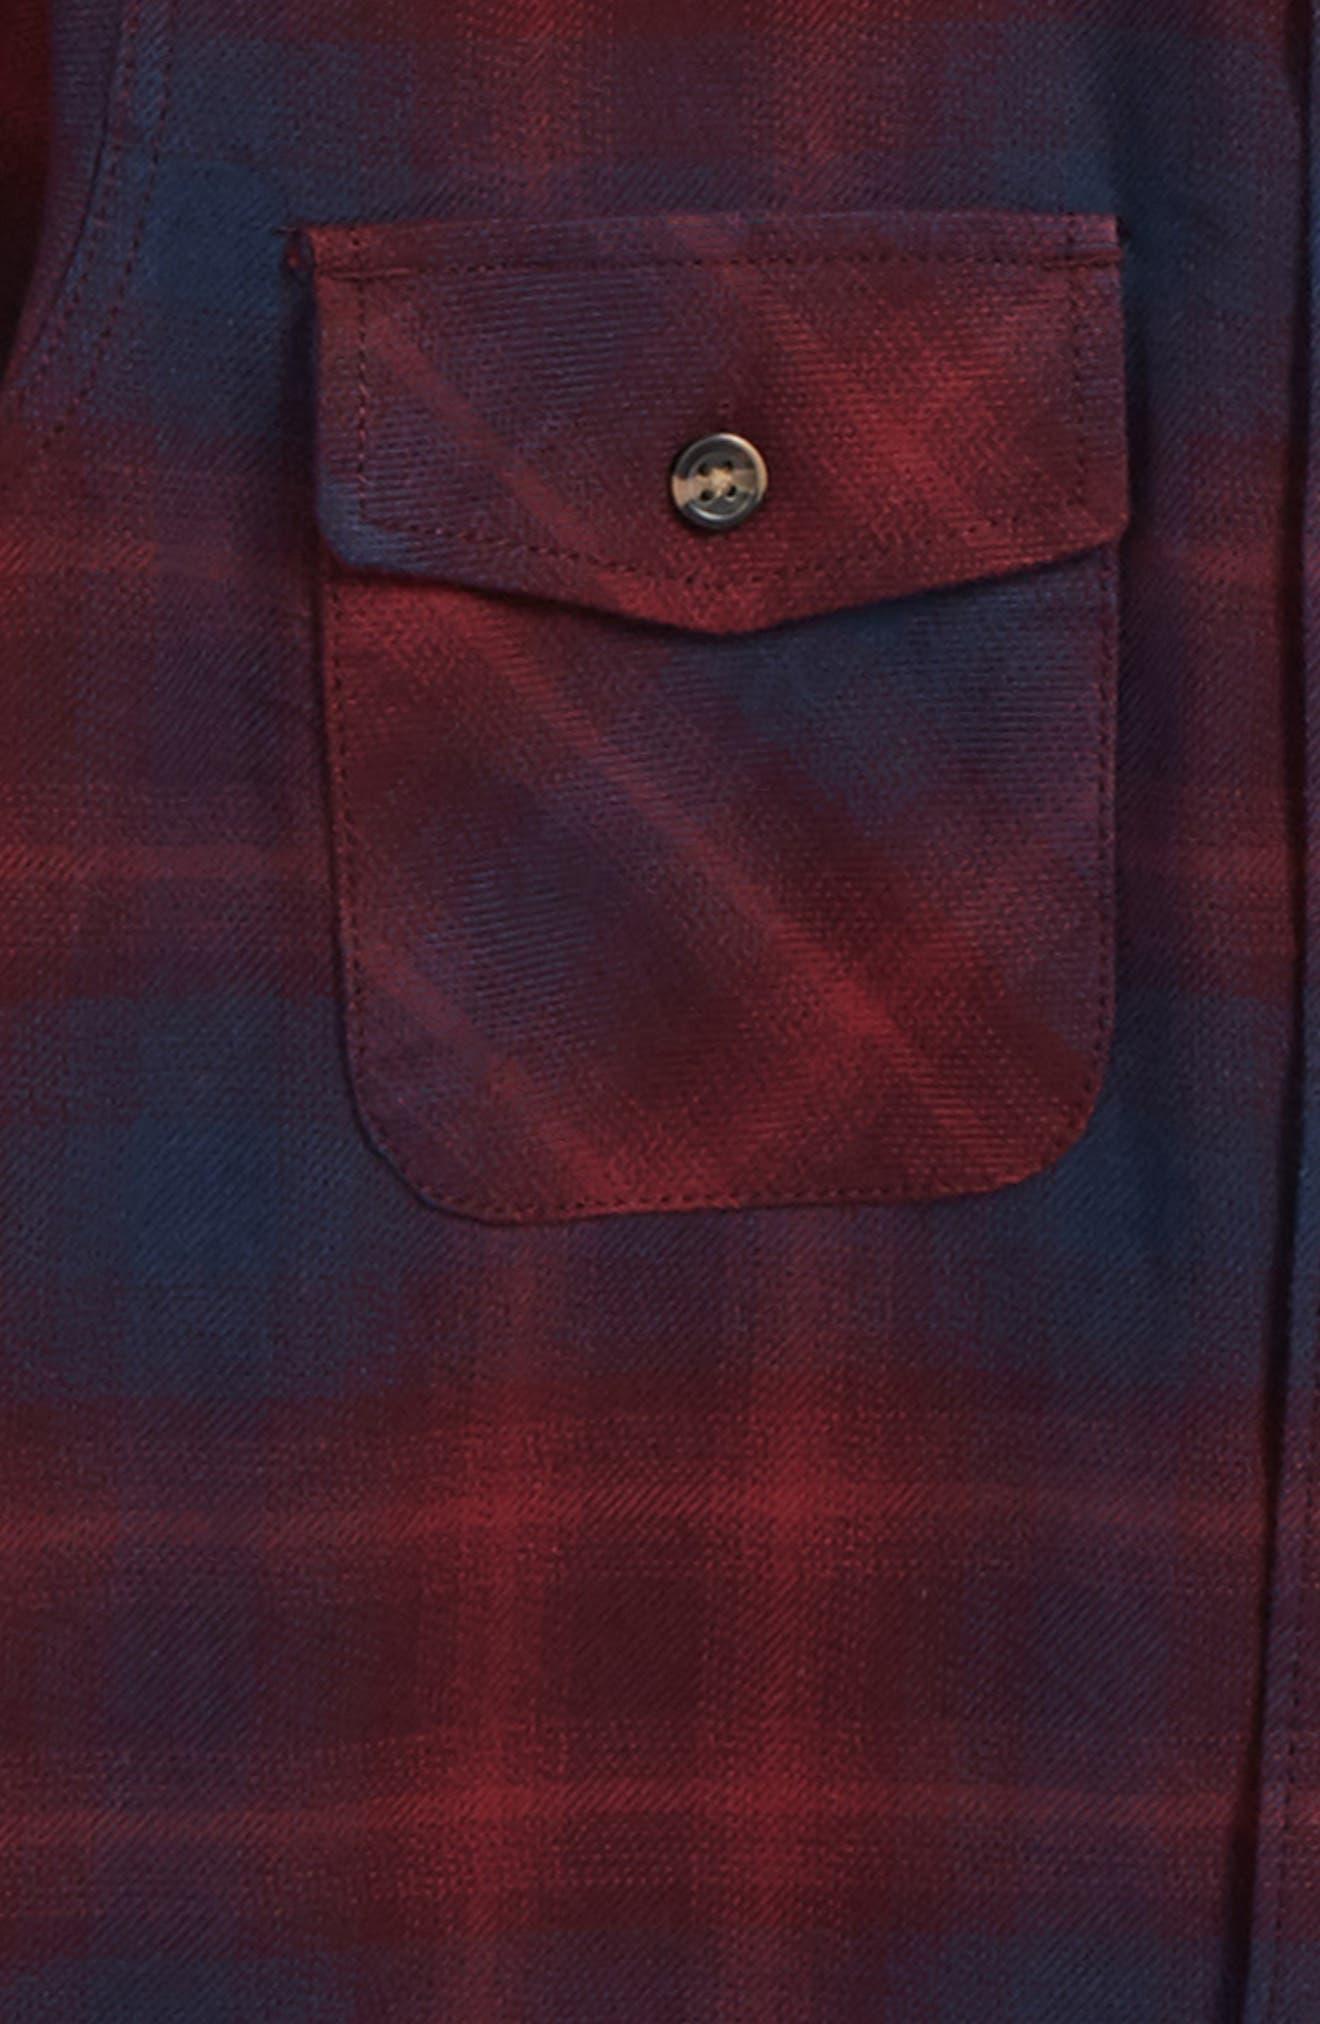 Monterey II Plaid Flannel Shirt,                             Alternate thumbnail 4, color,